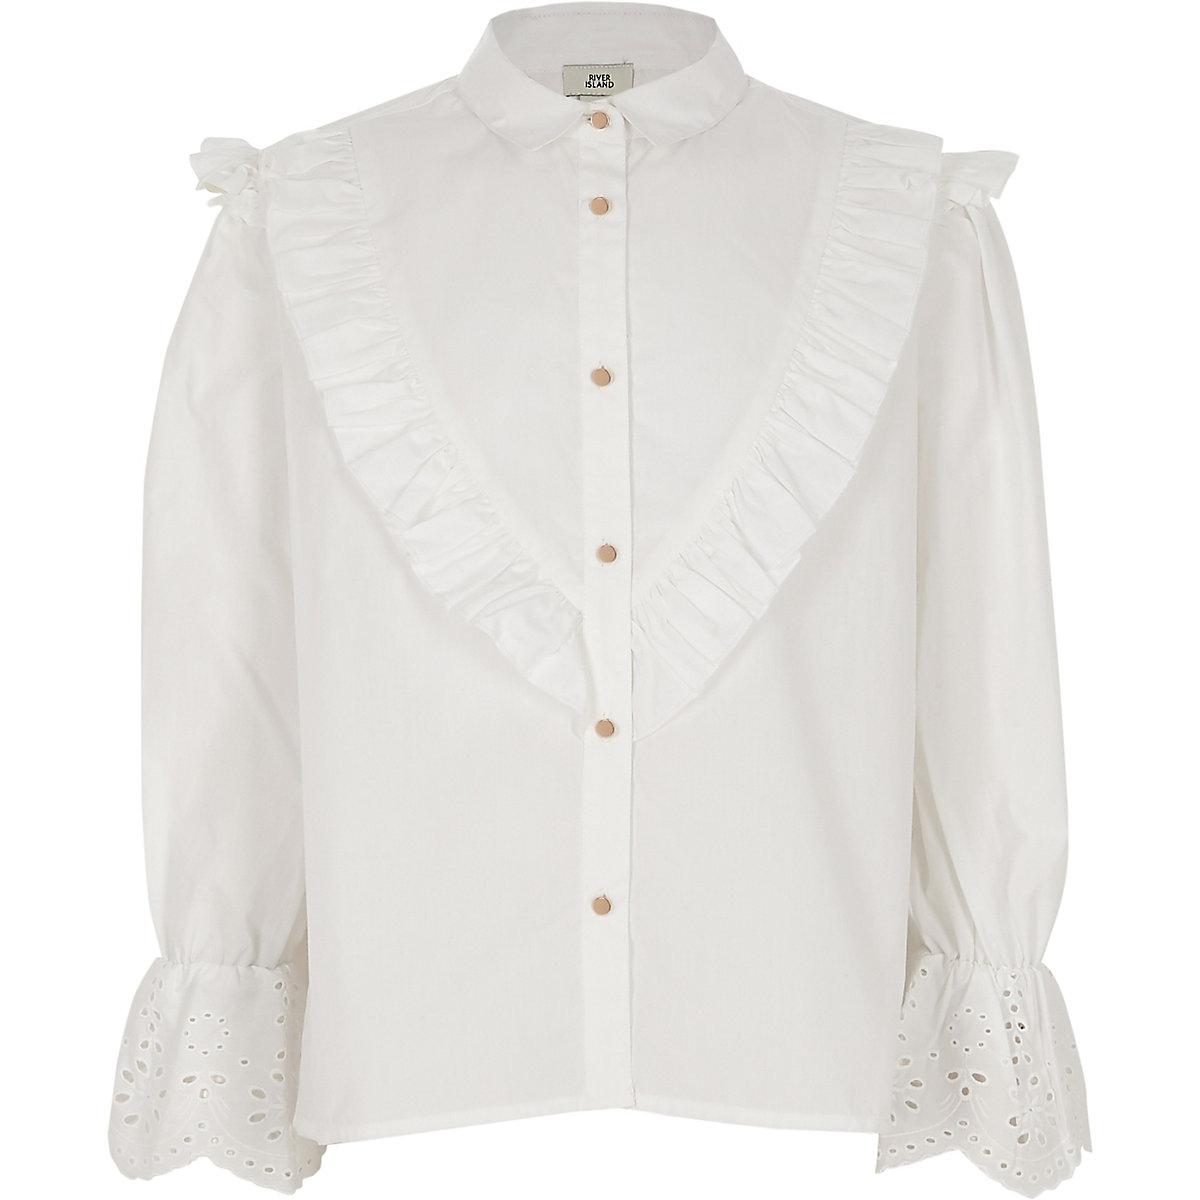 Girls white poplin embroidered sleeve shirt